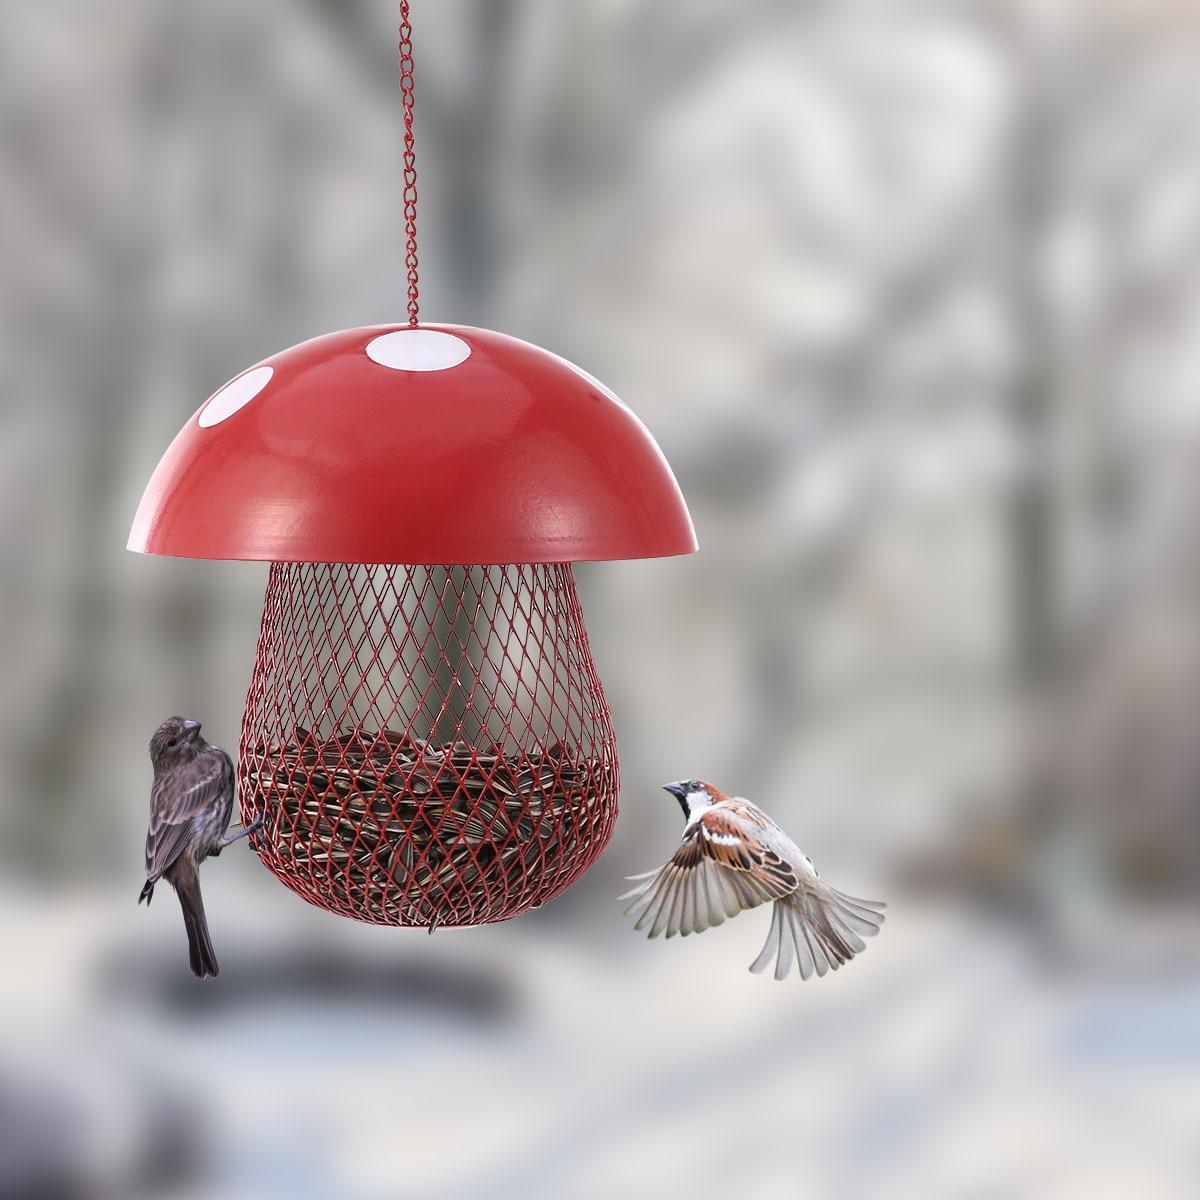 Mushroom-shaped Bird Feeder Wild Bird Seed Feeder Outdoor Decorative Garden Metal Hanging Food Mesh House Кормушка